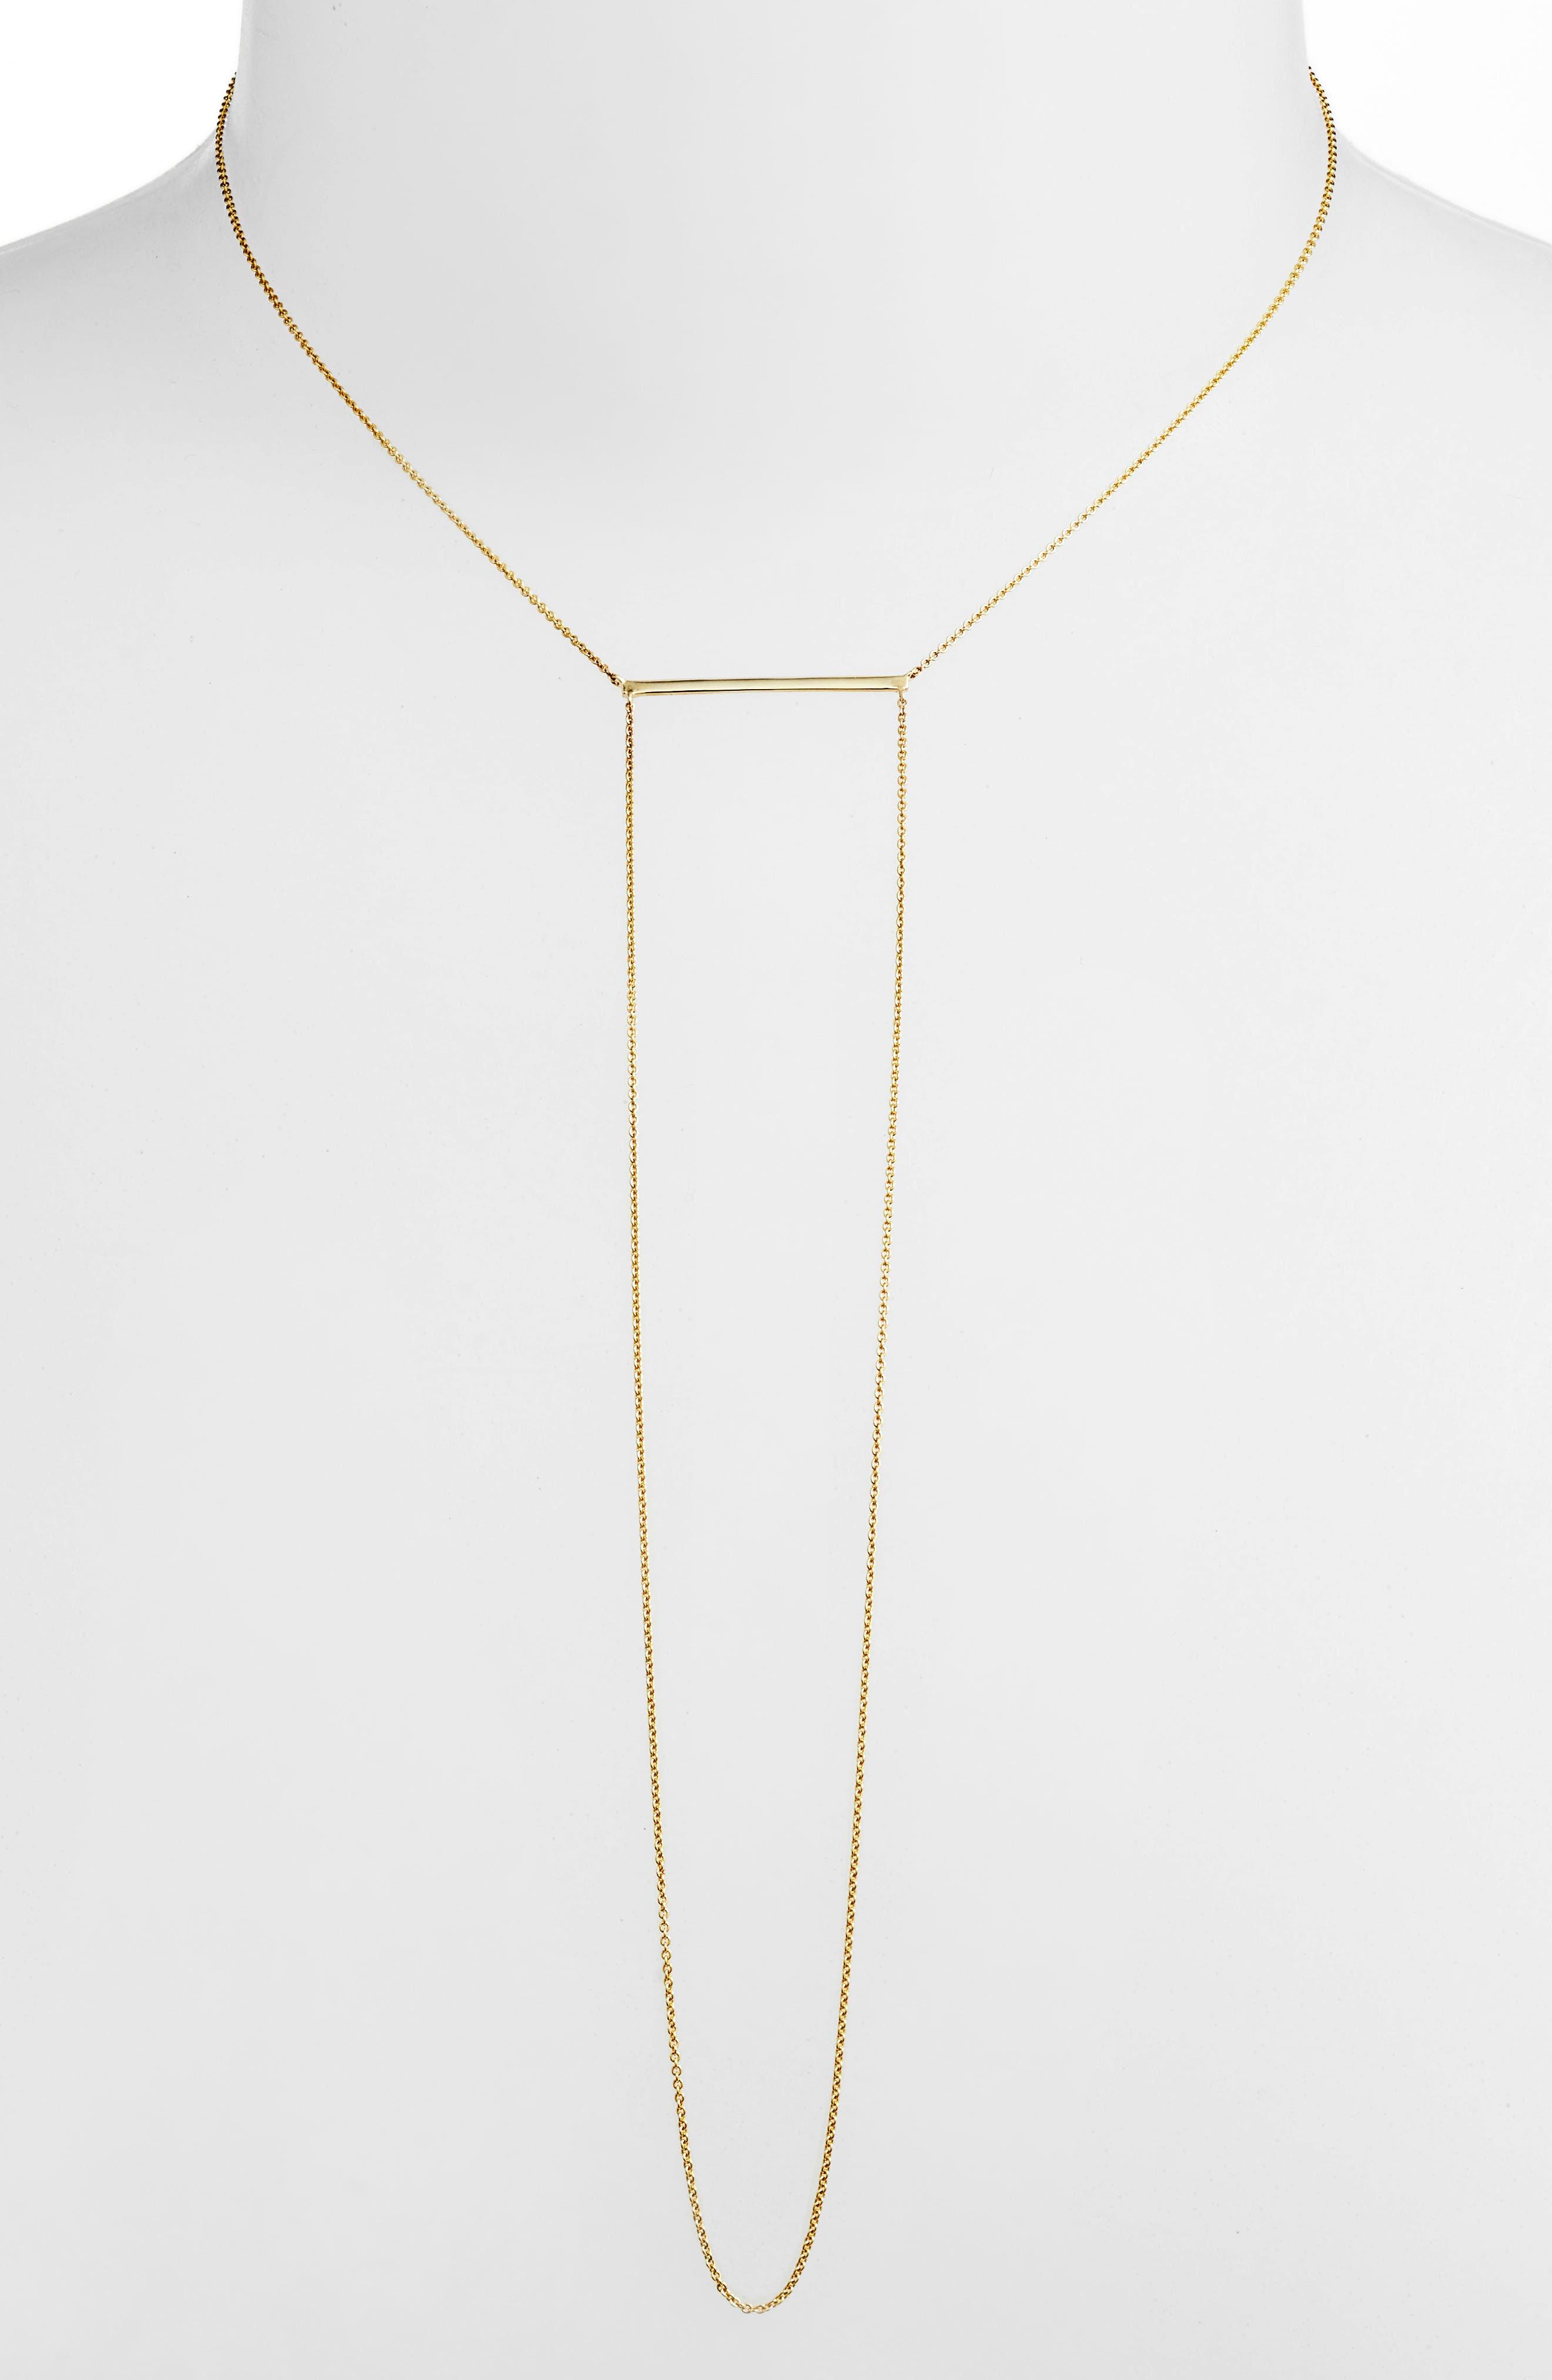 Drama Bar Pendant Necklace,                             Alternate thumbnail 2, color,                             YELLOW GOLD